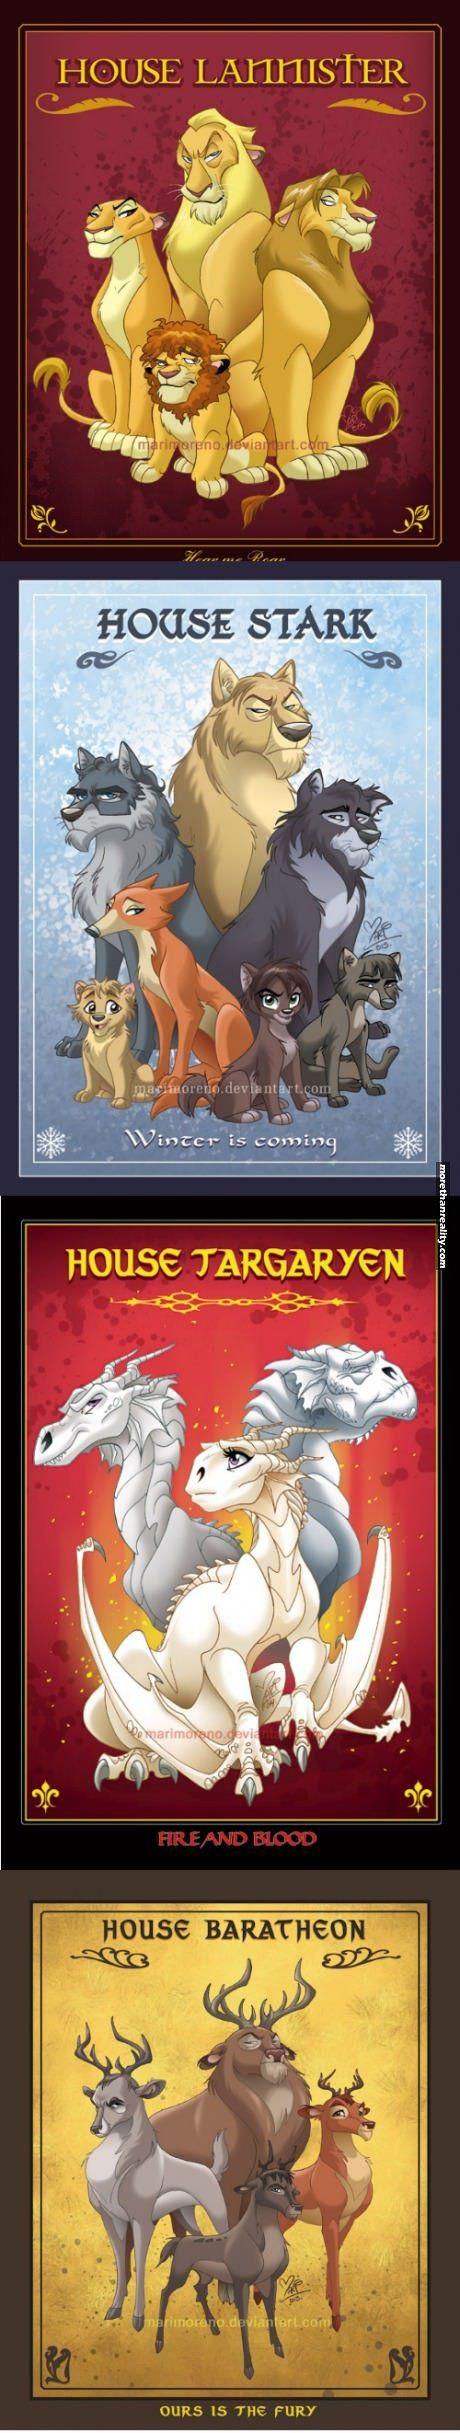 Game of Thrones Disney version